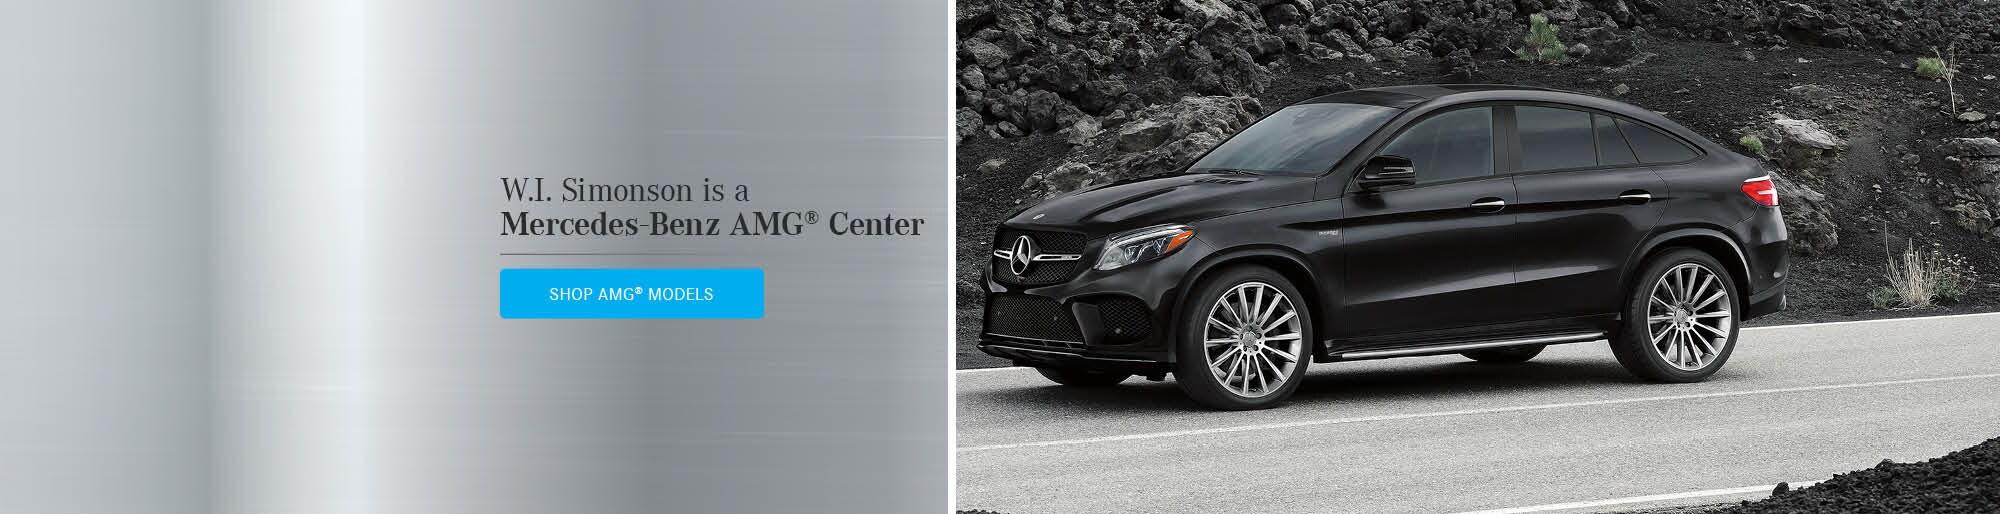 W.I. Simonson | Mercedes-Benz Dealership in Santa Monica